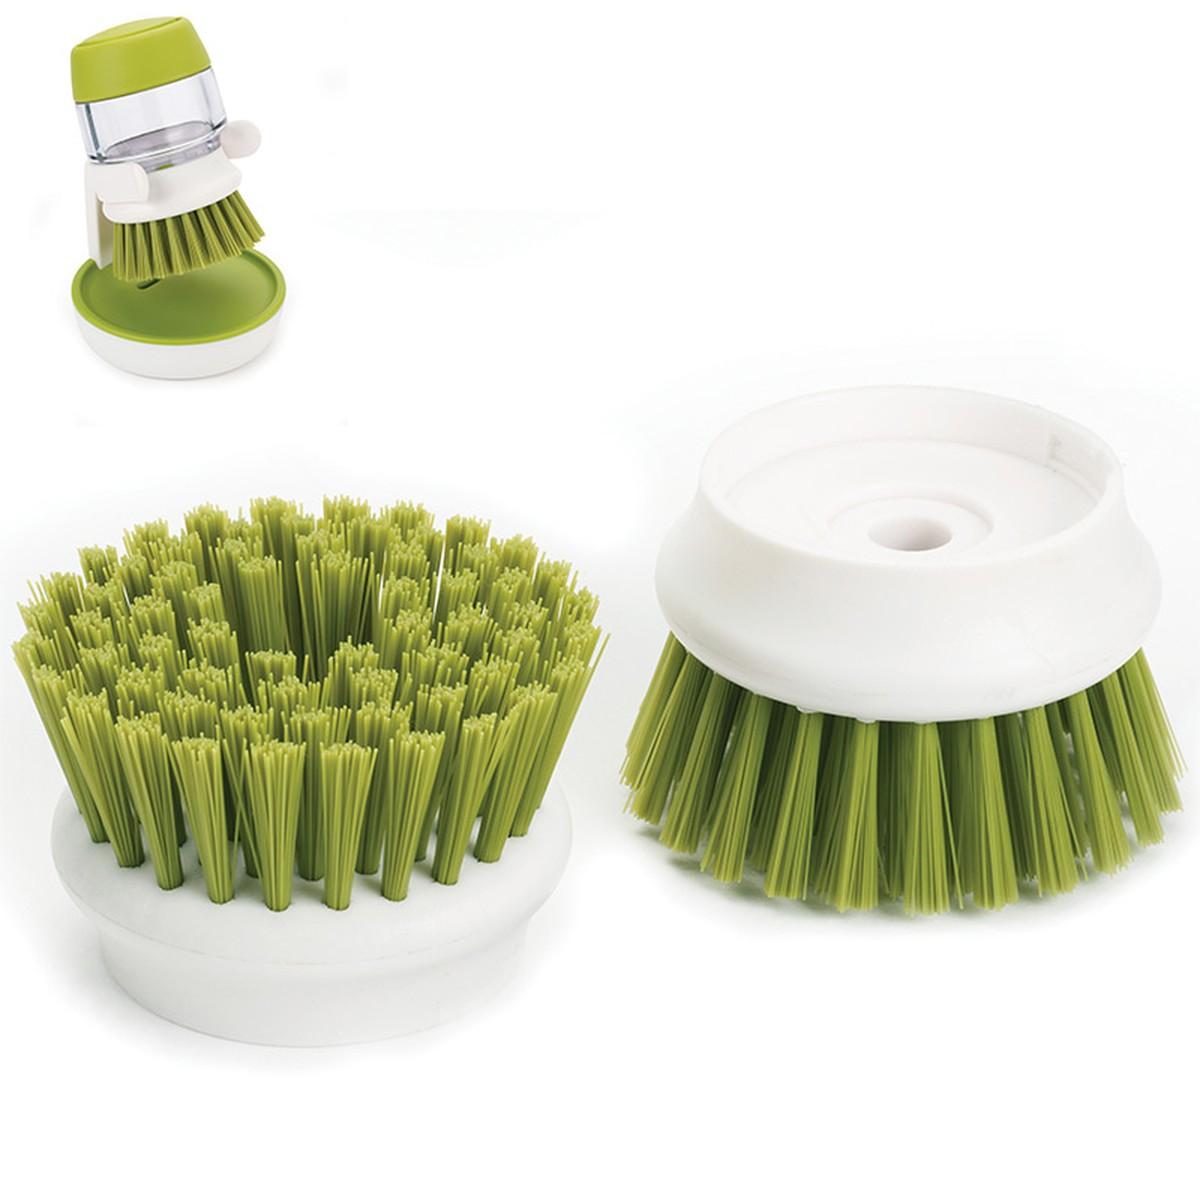 Онлайн каталог PROMENU: Насадки сменные для щетки с дозатором Joseph Joseph palm scrub, 2 шт, зеленый Joseph Joseph 85038